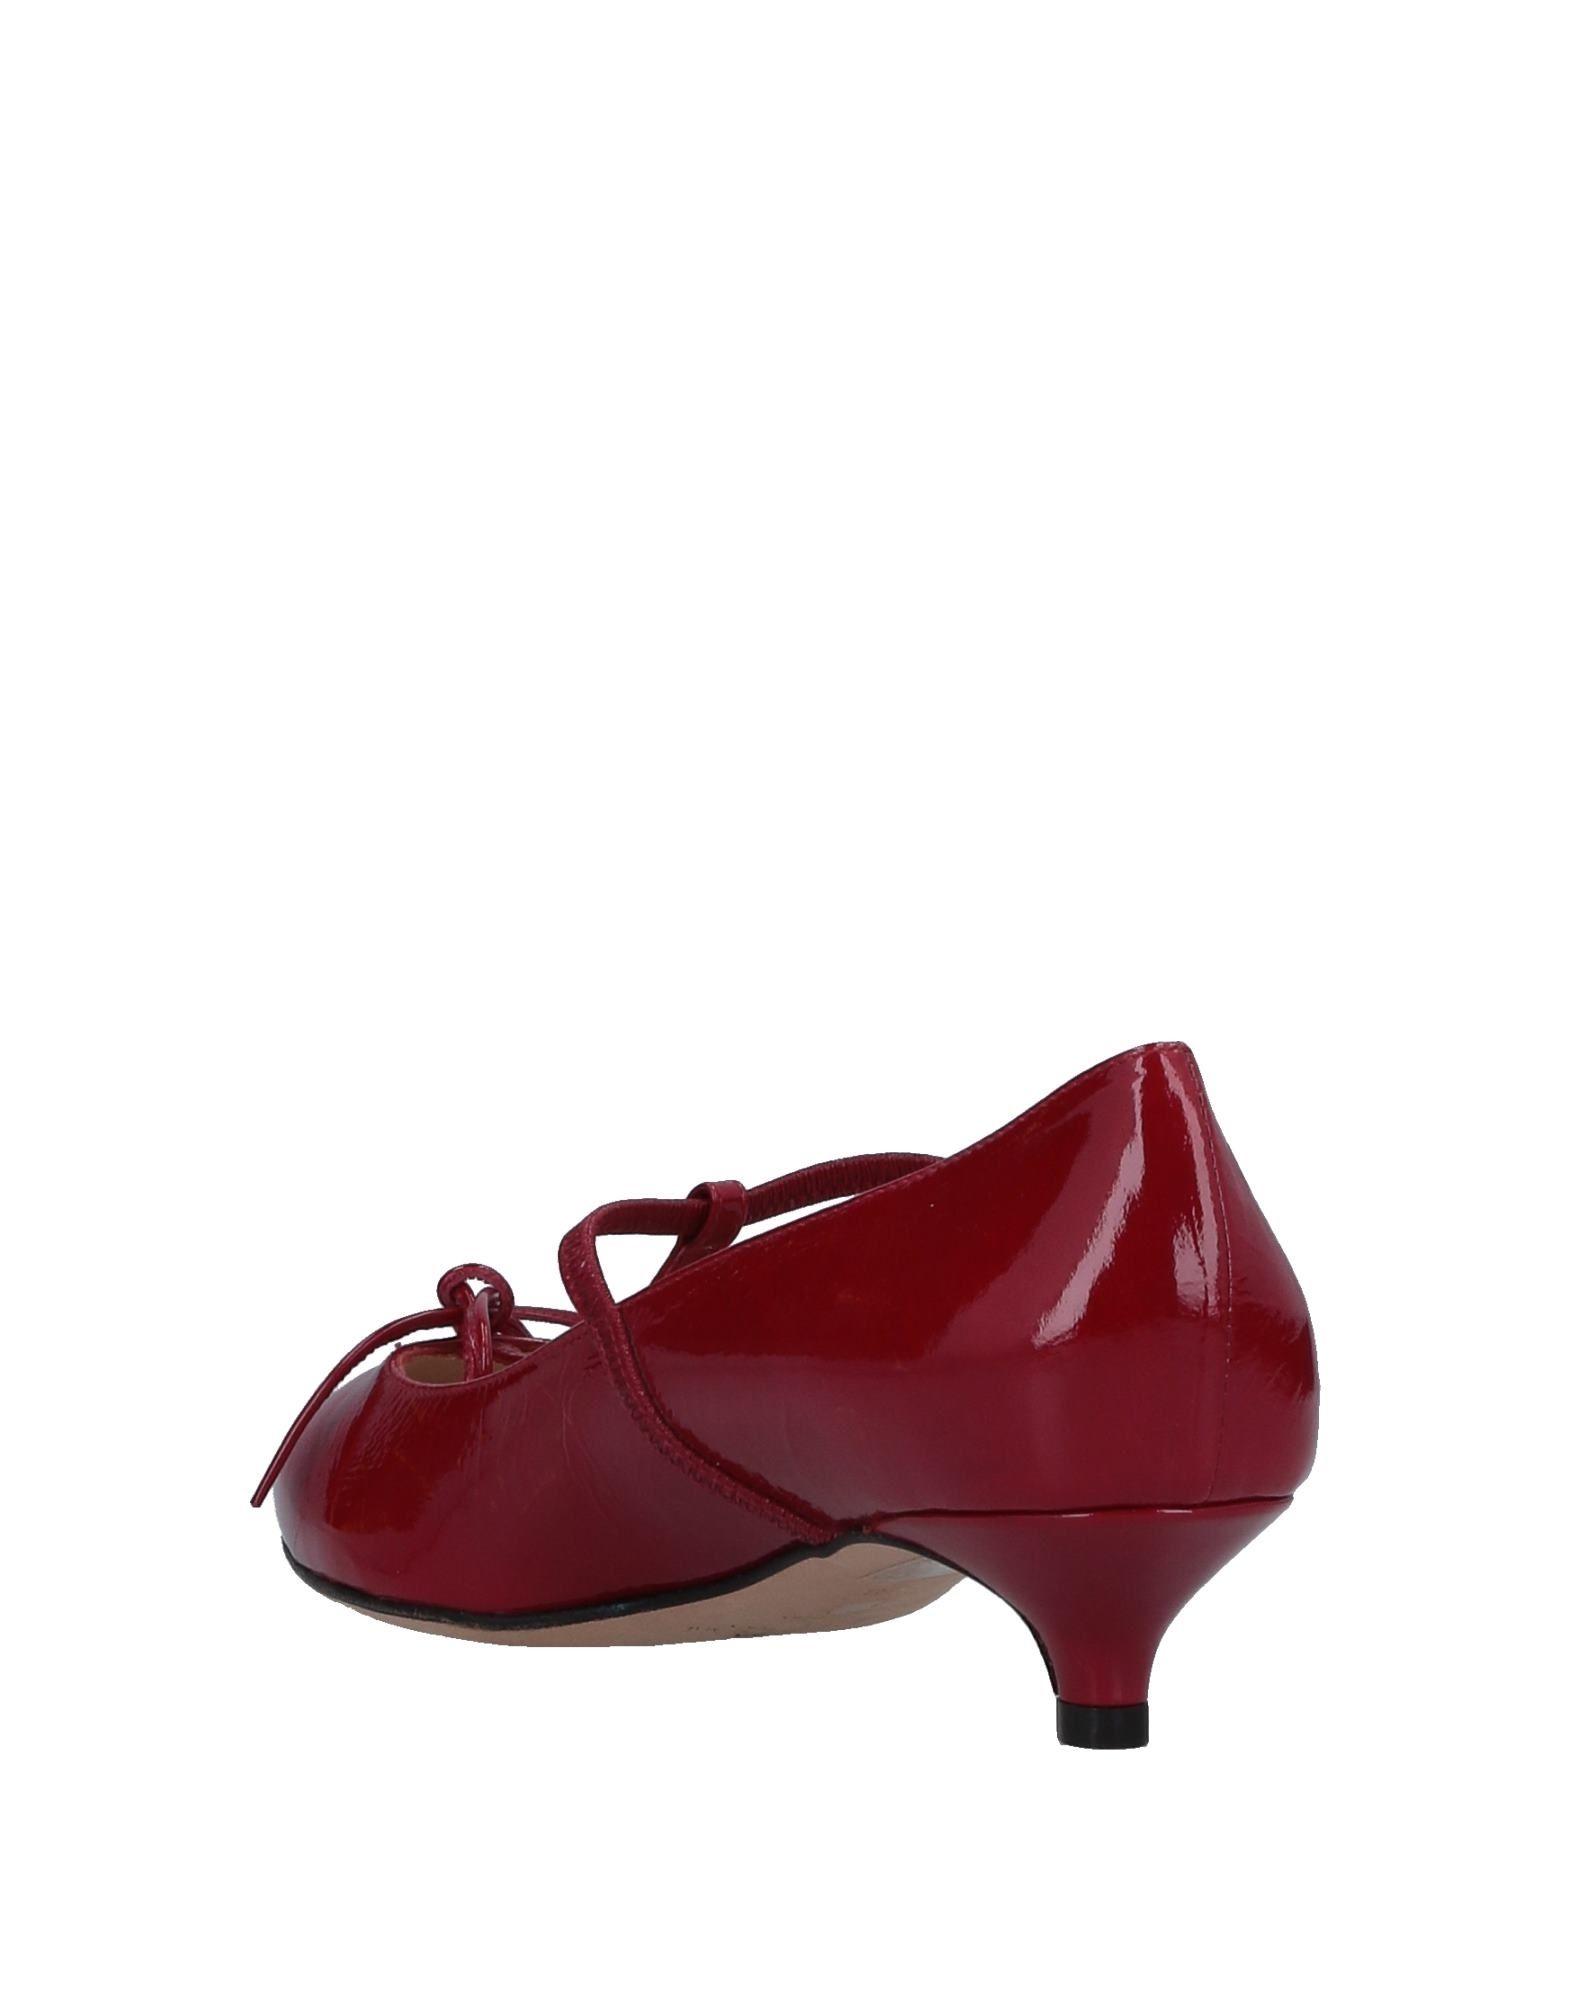 Stilvolle billige Pumps Schuhe Daniele Ancarani Pumps billige Damen  11518884XB 92dad0